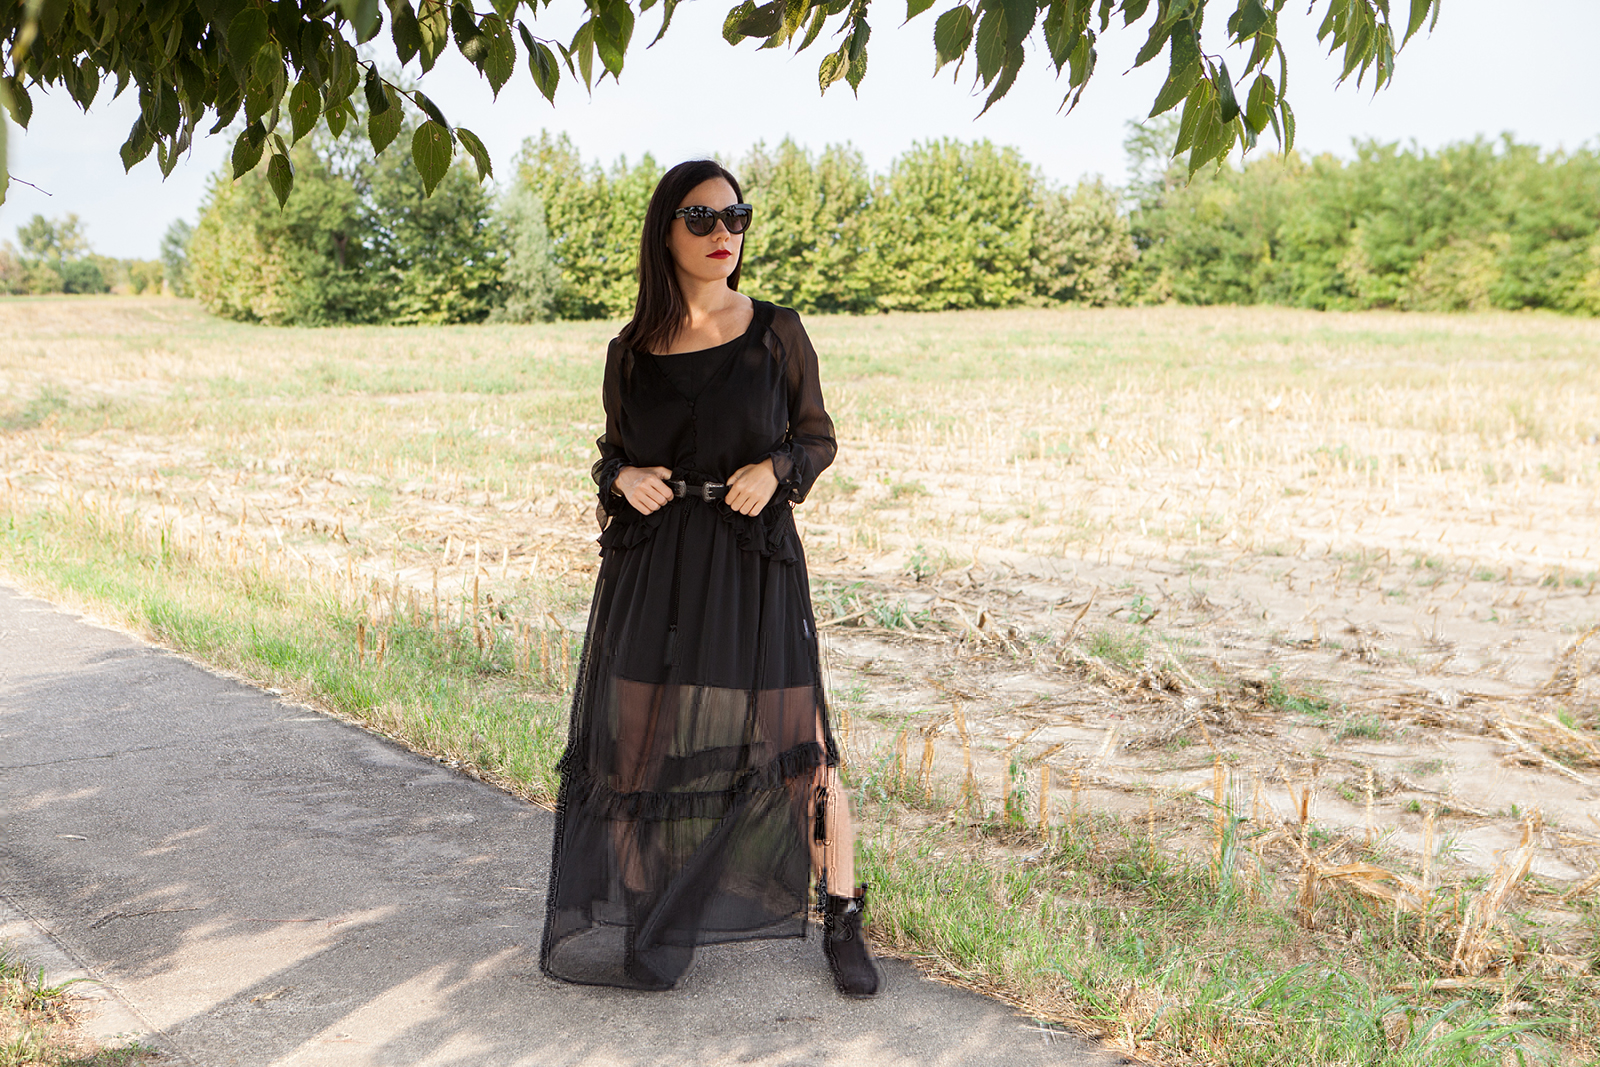 Stivaletti bassi per l'autunno: come indossarli da mattina a sera